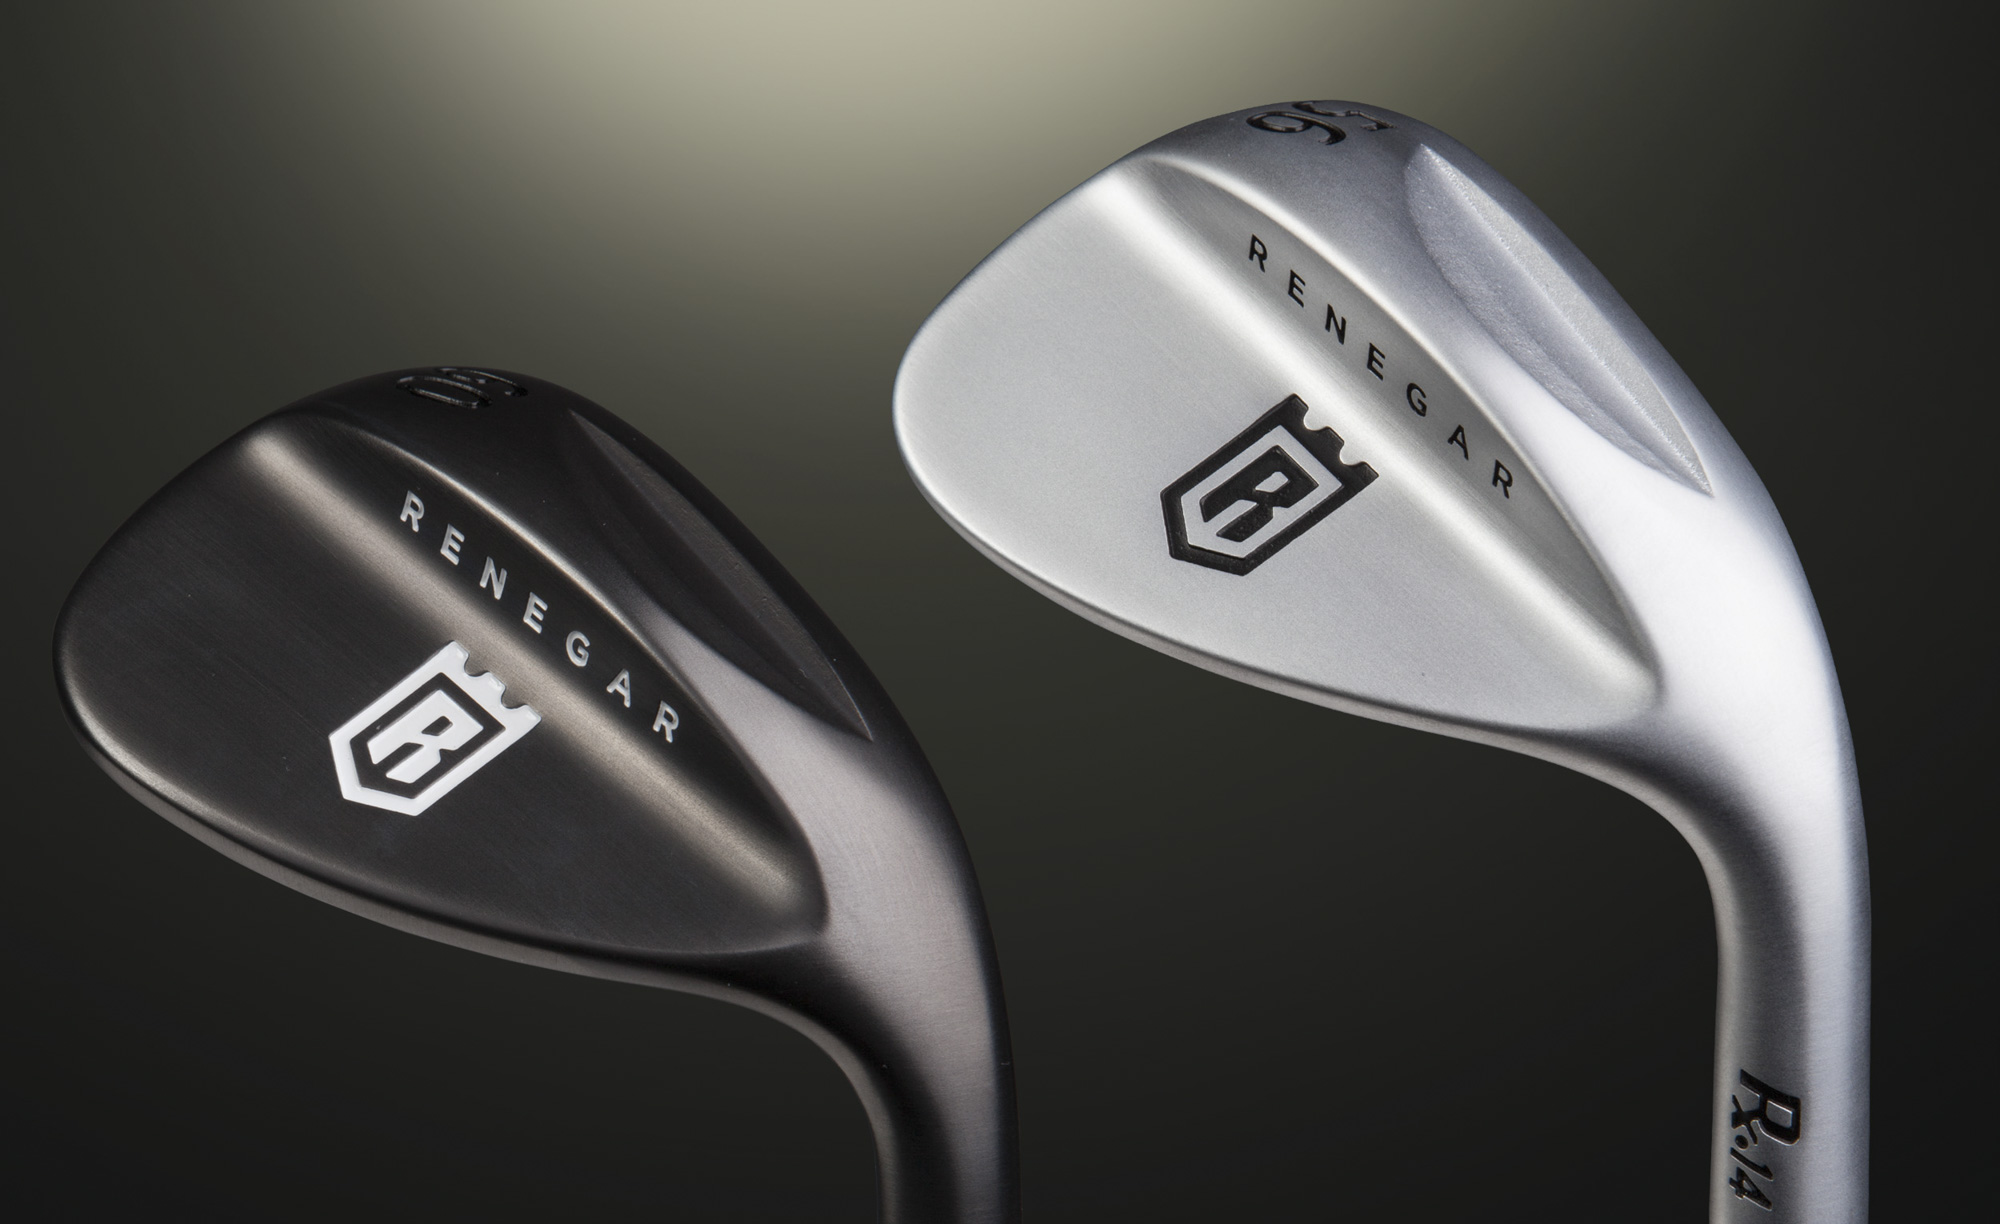 Golf clubs made by Renegar